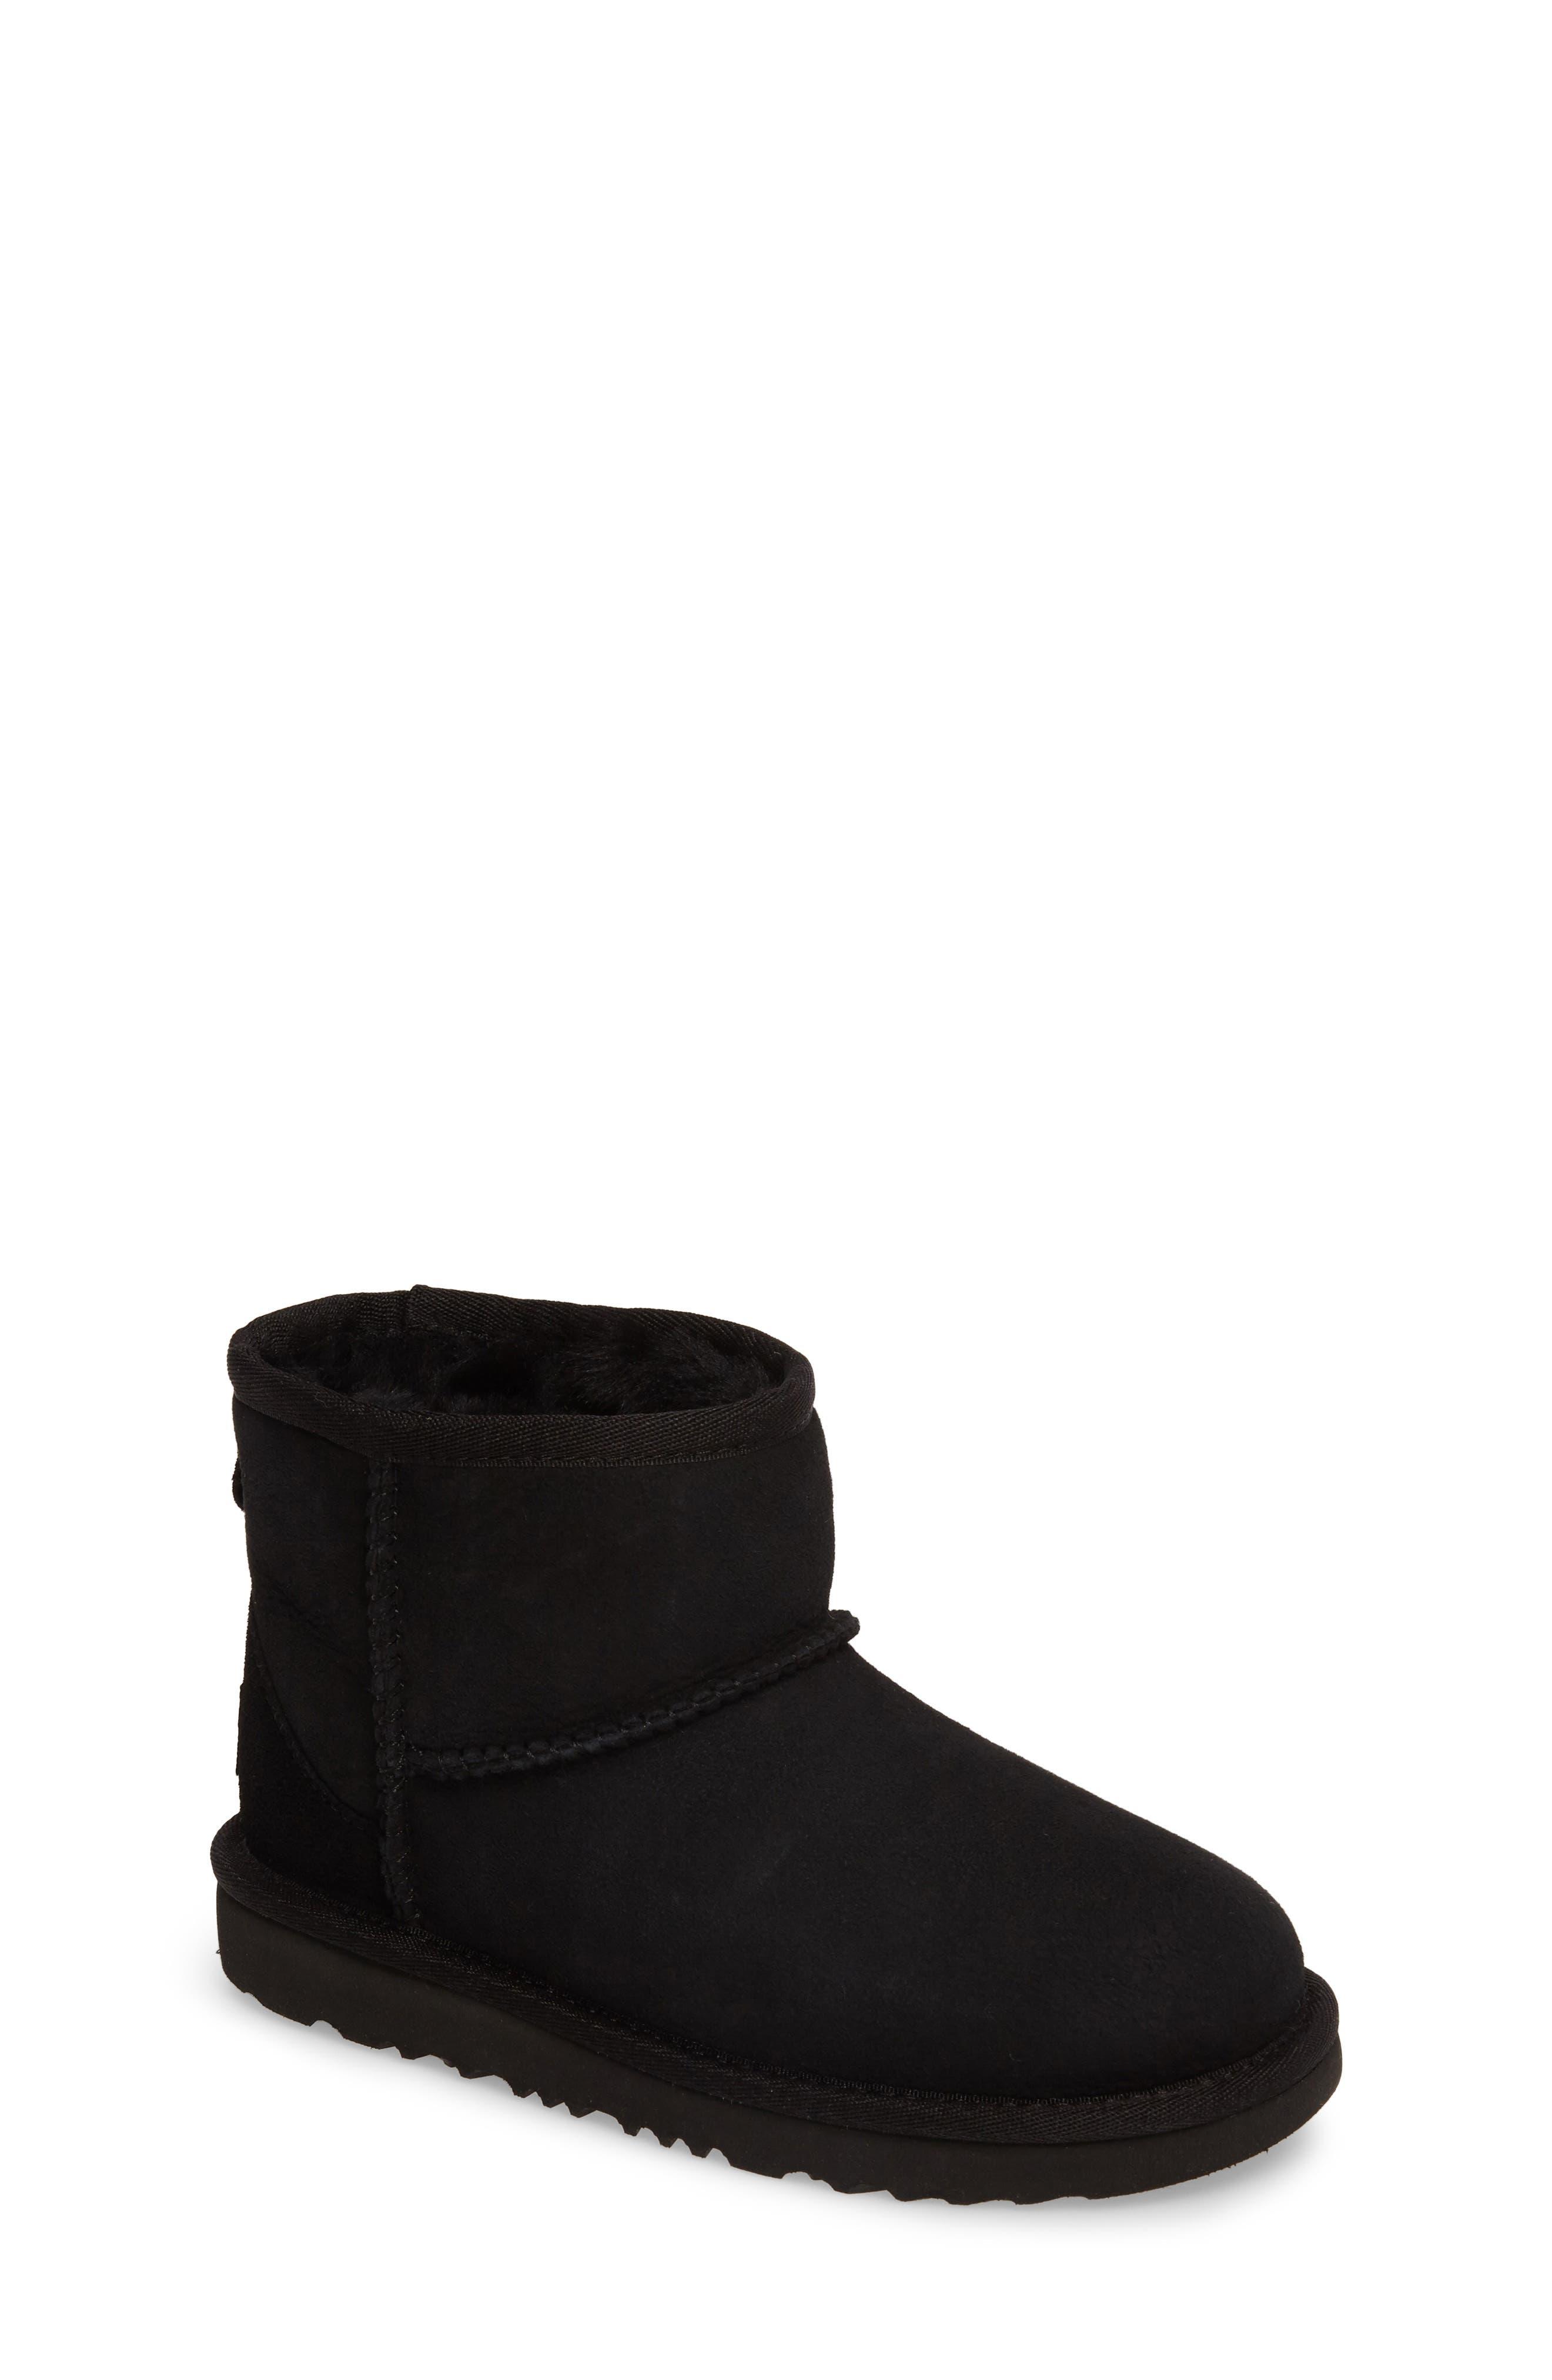 UGG<SUP>®</SUP>, Classic Mini II Water-Resistant Genuine Shearling Boot, Main thumbnail 1, color, BLACK